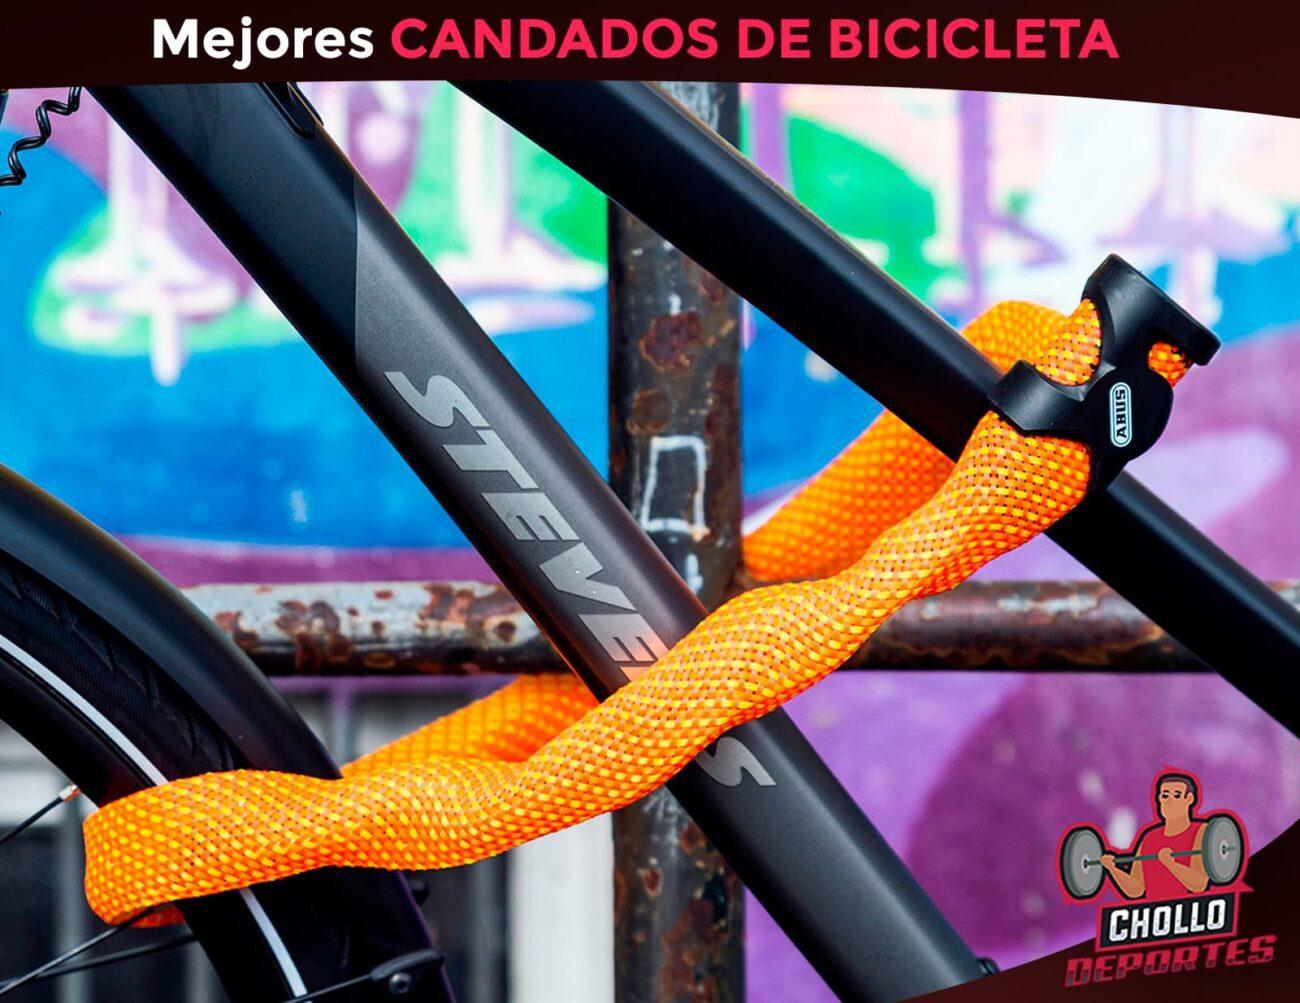 Mejores candados de bicicleta